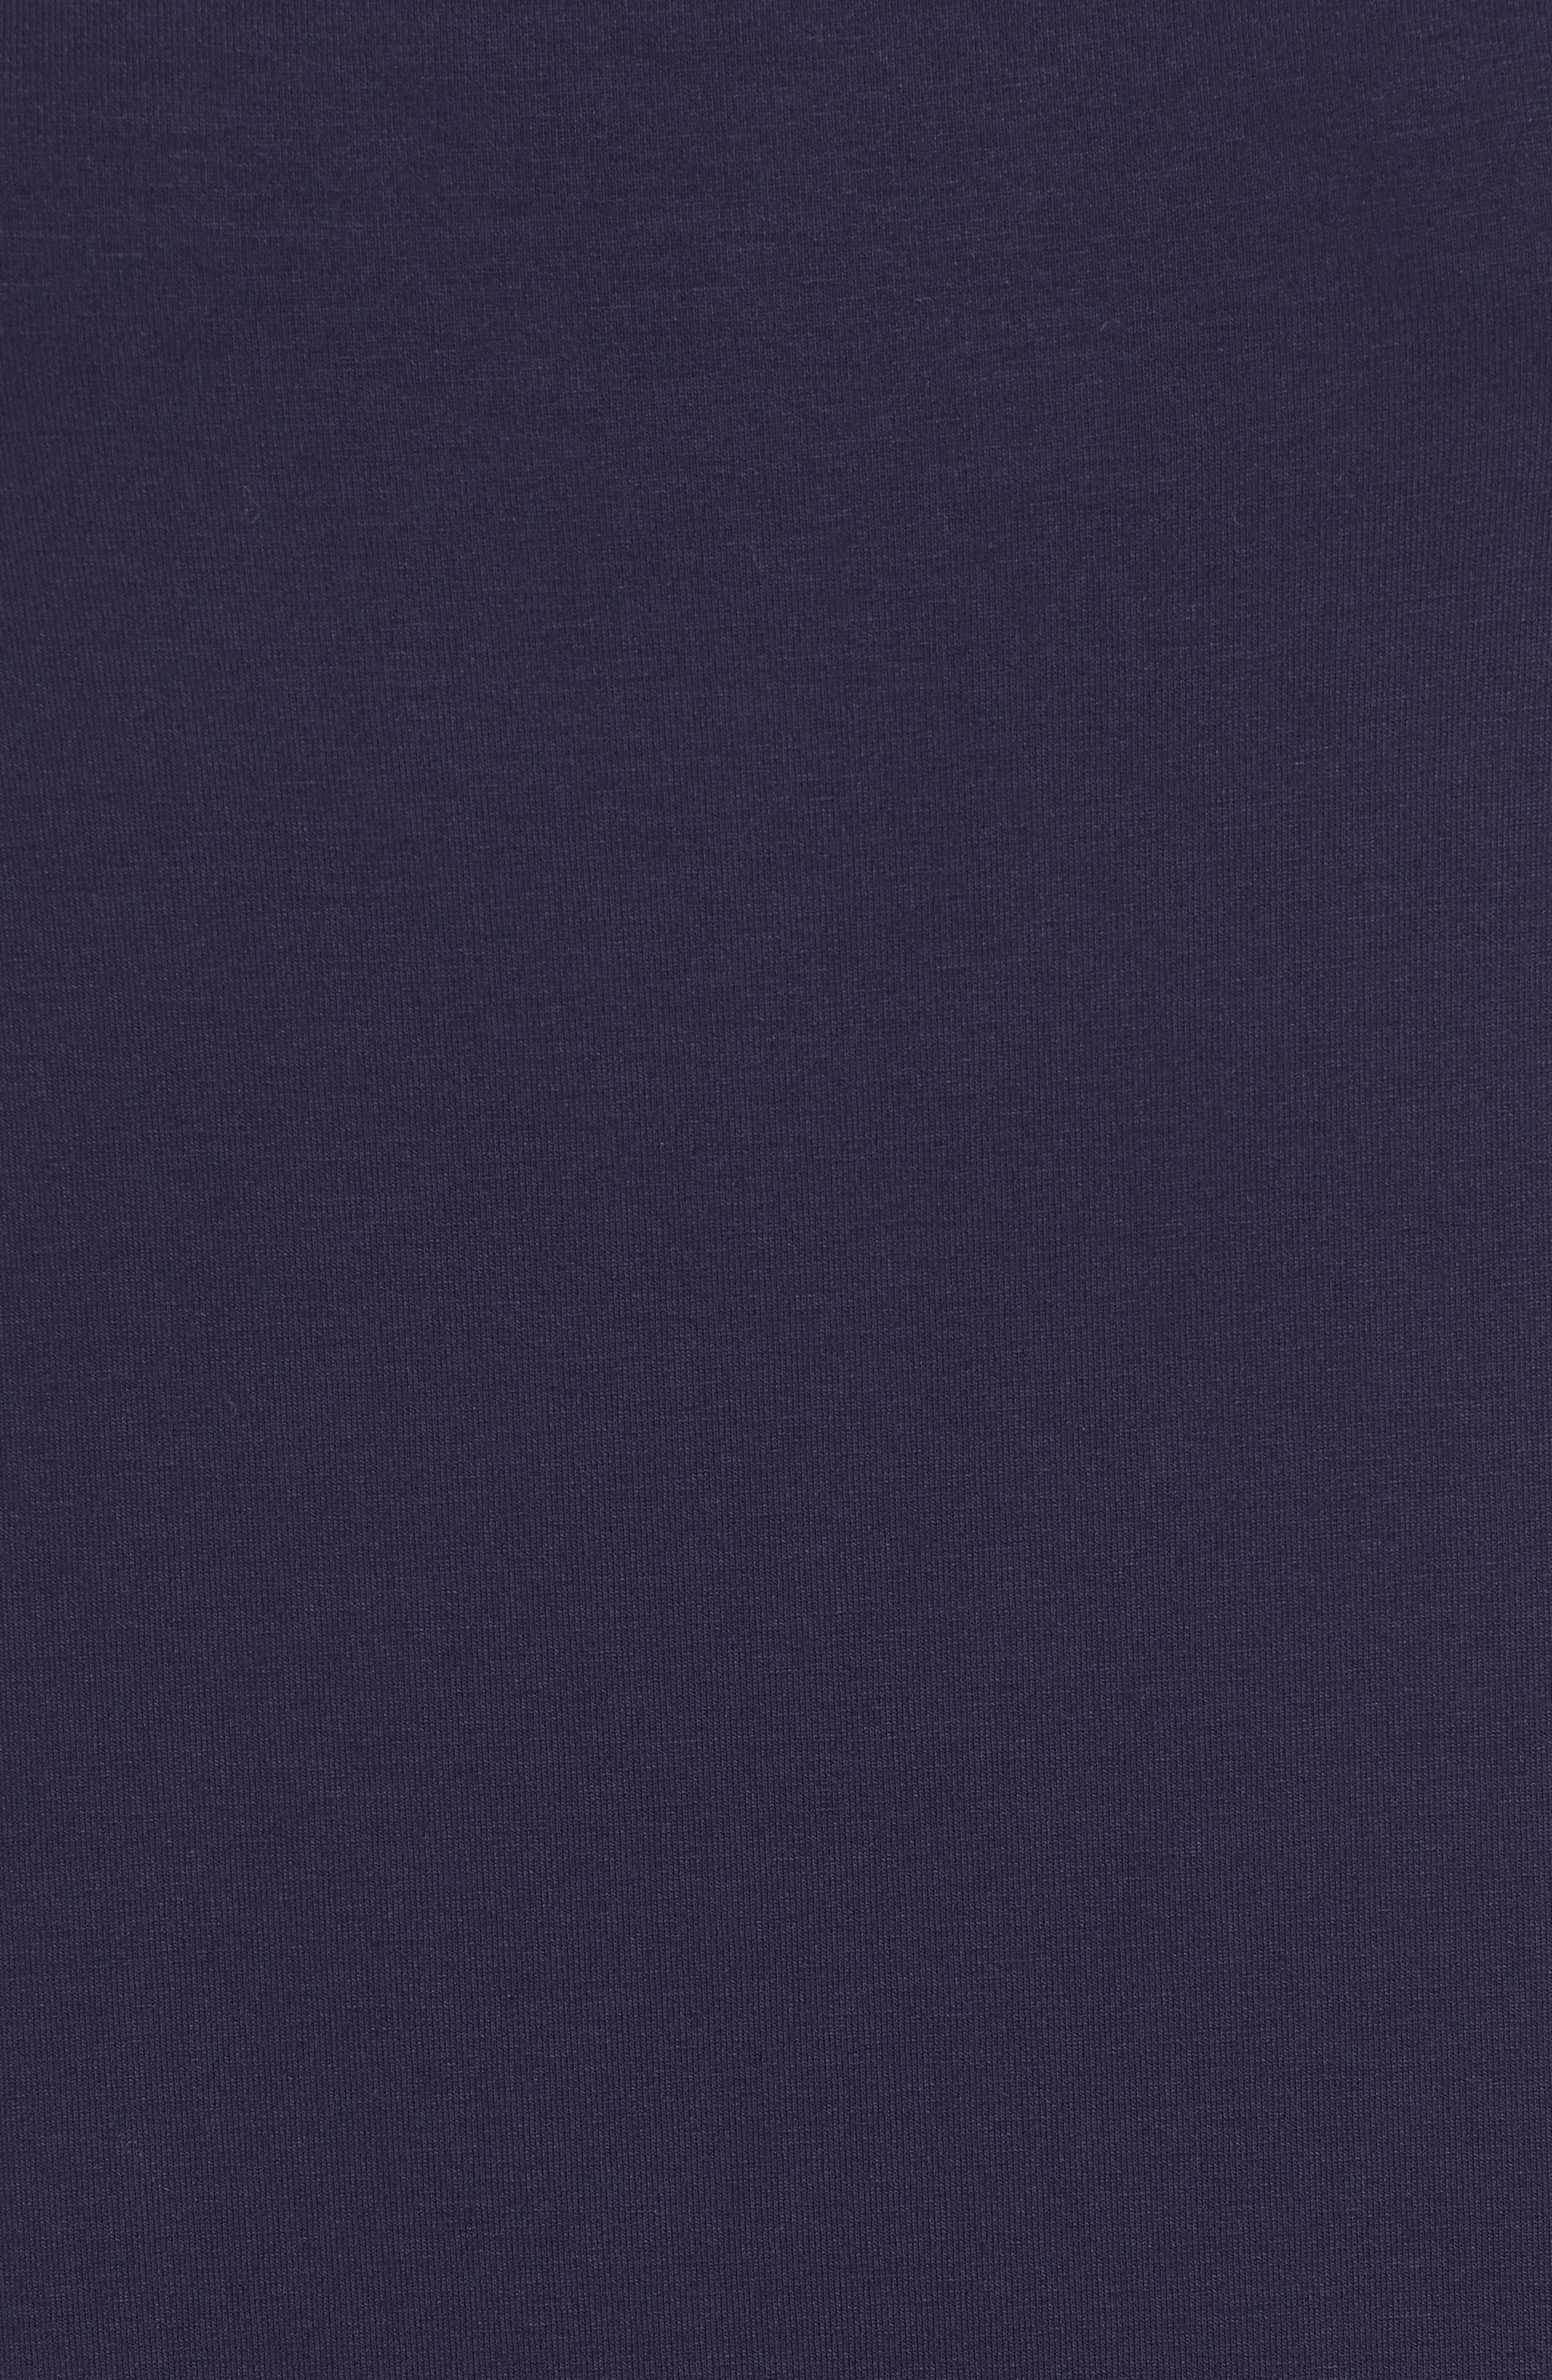 Midi Tank Dress,                             Alternate thumbnail 6, color,                             MIDNIGHT